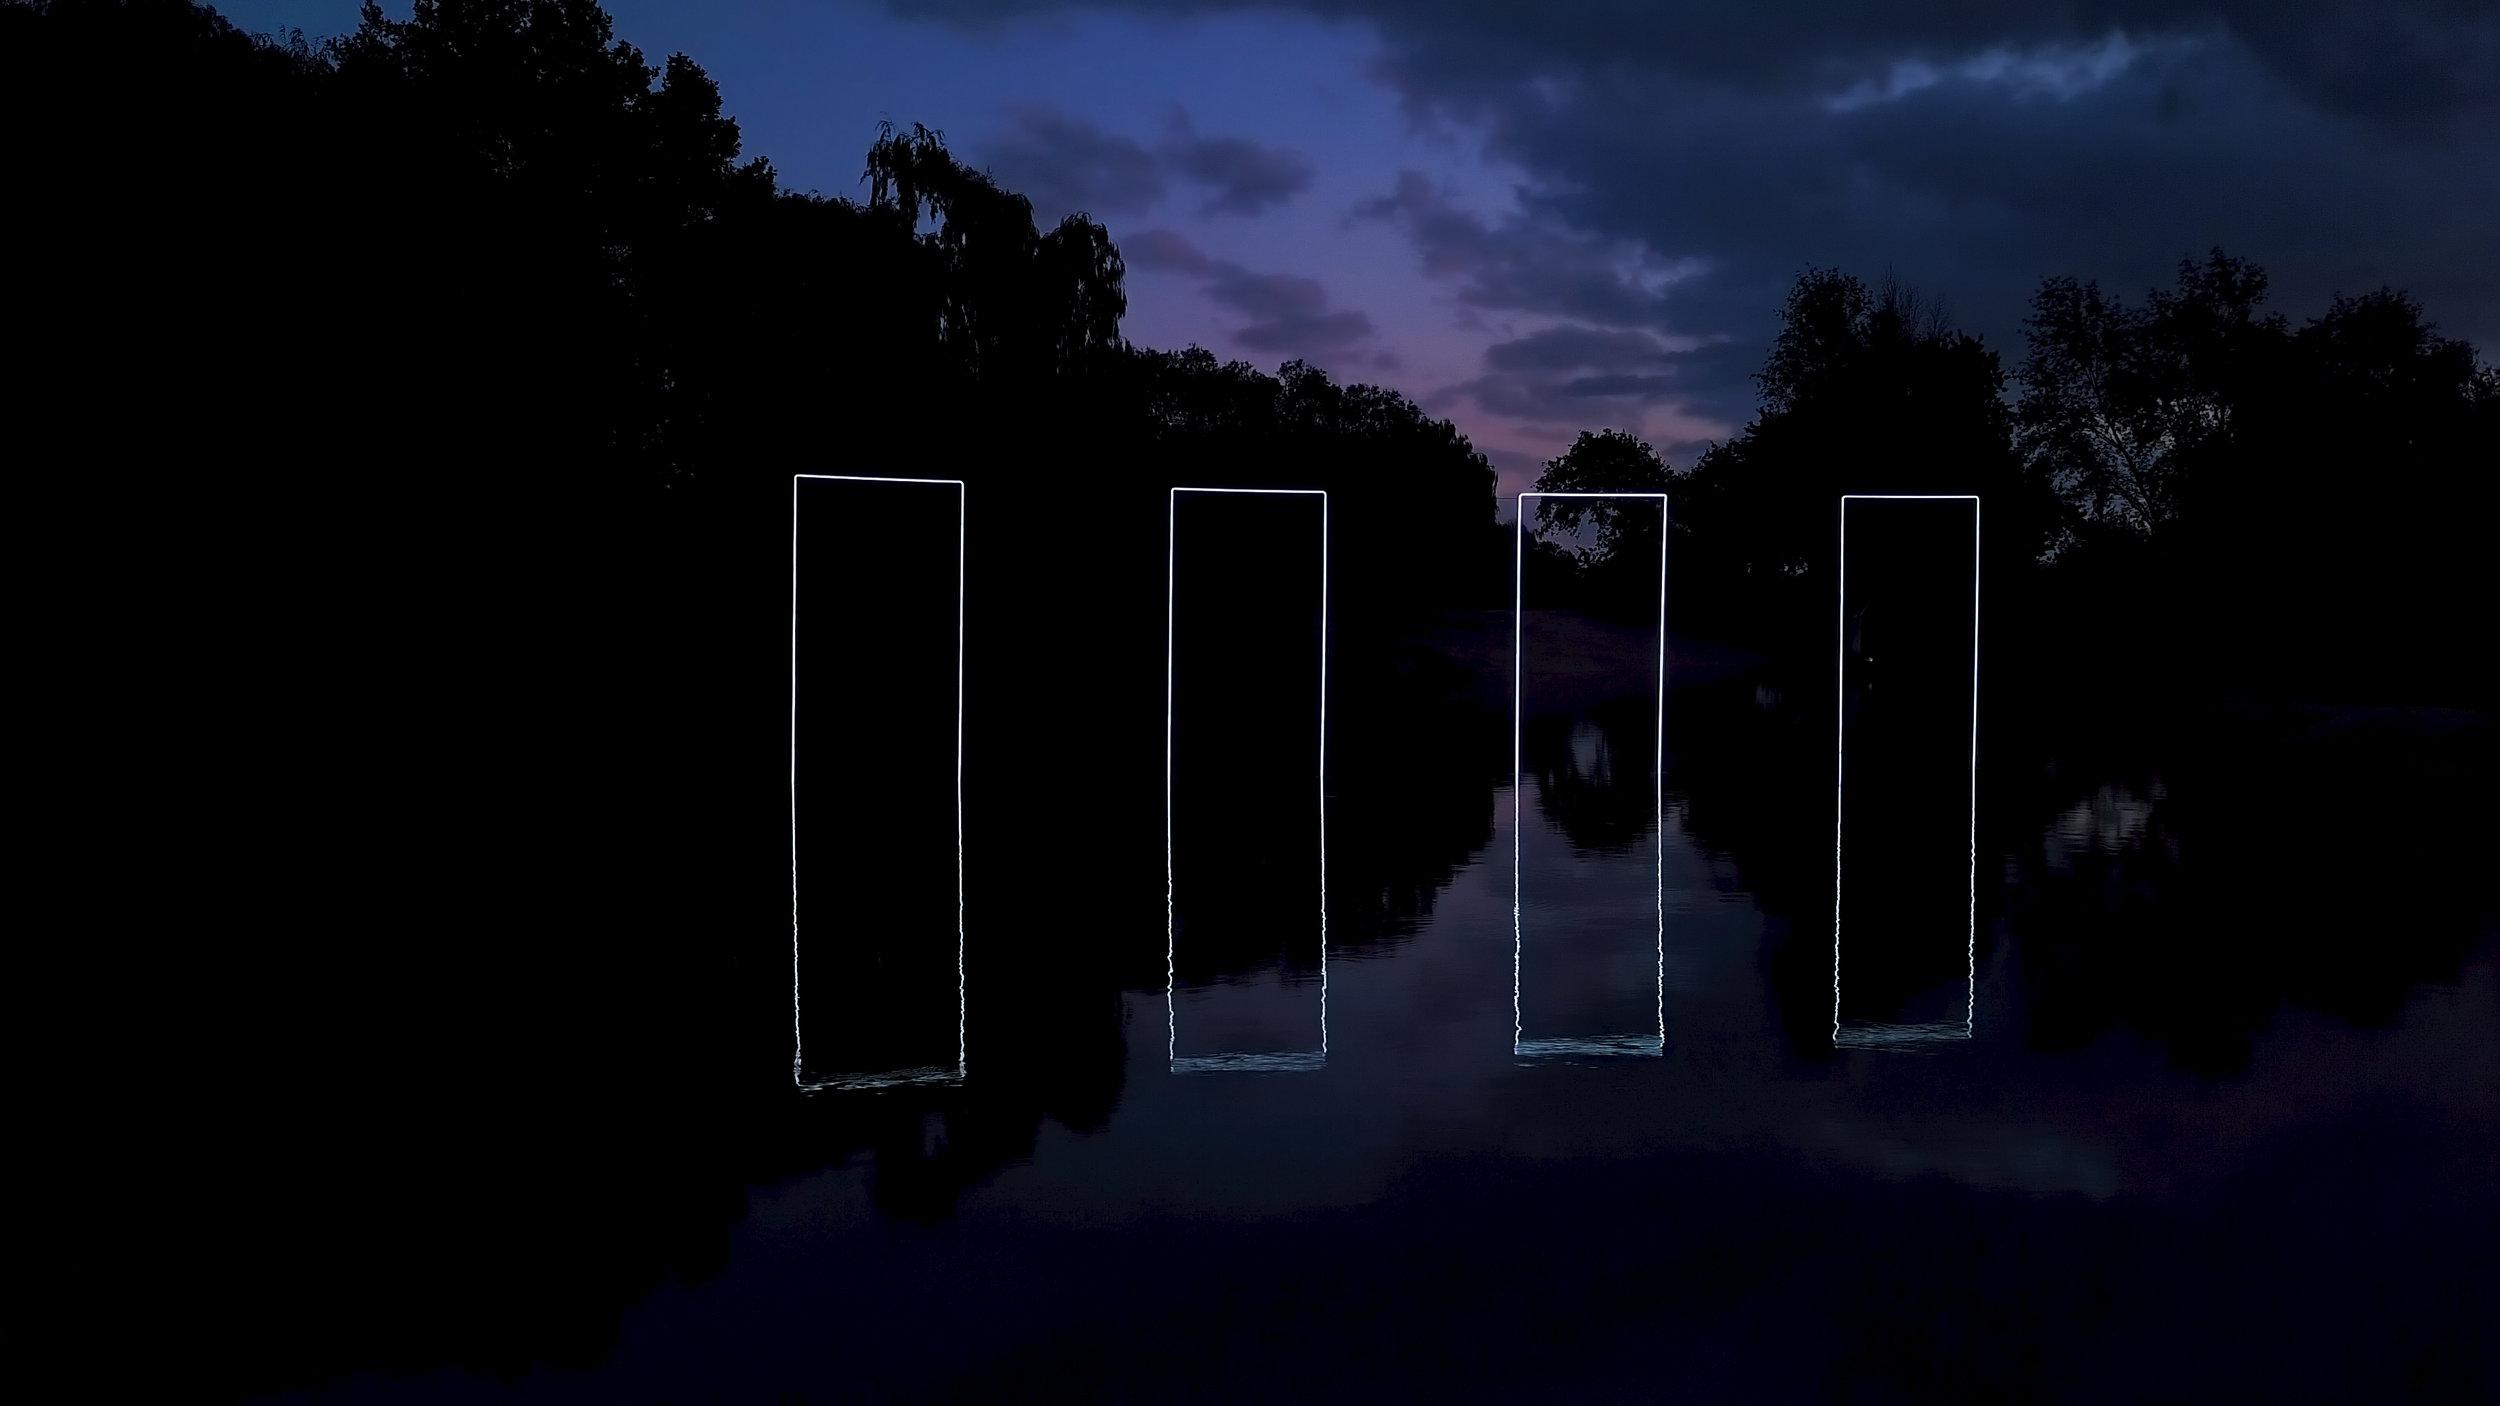 Four Doors -